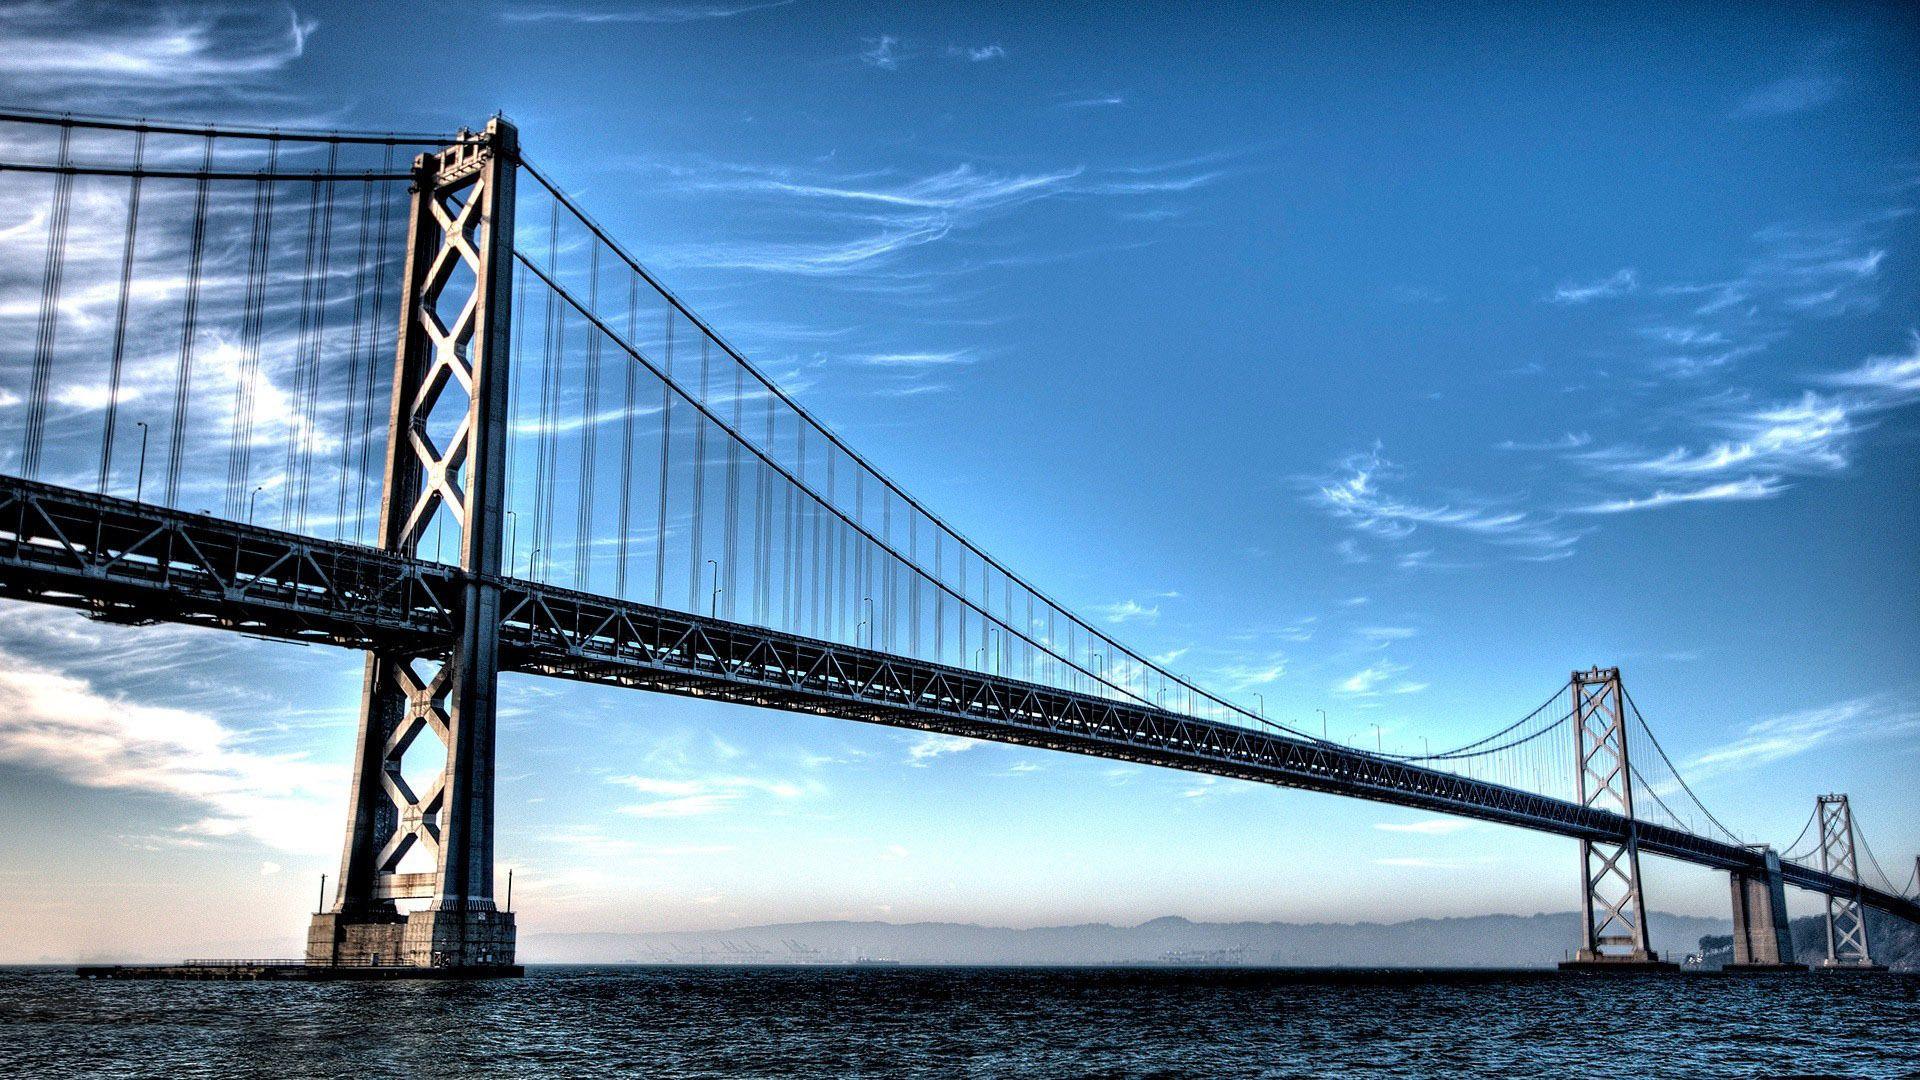 san francisco oakland bay bridge the entrance to our favorite